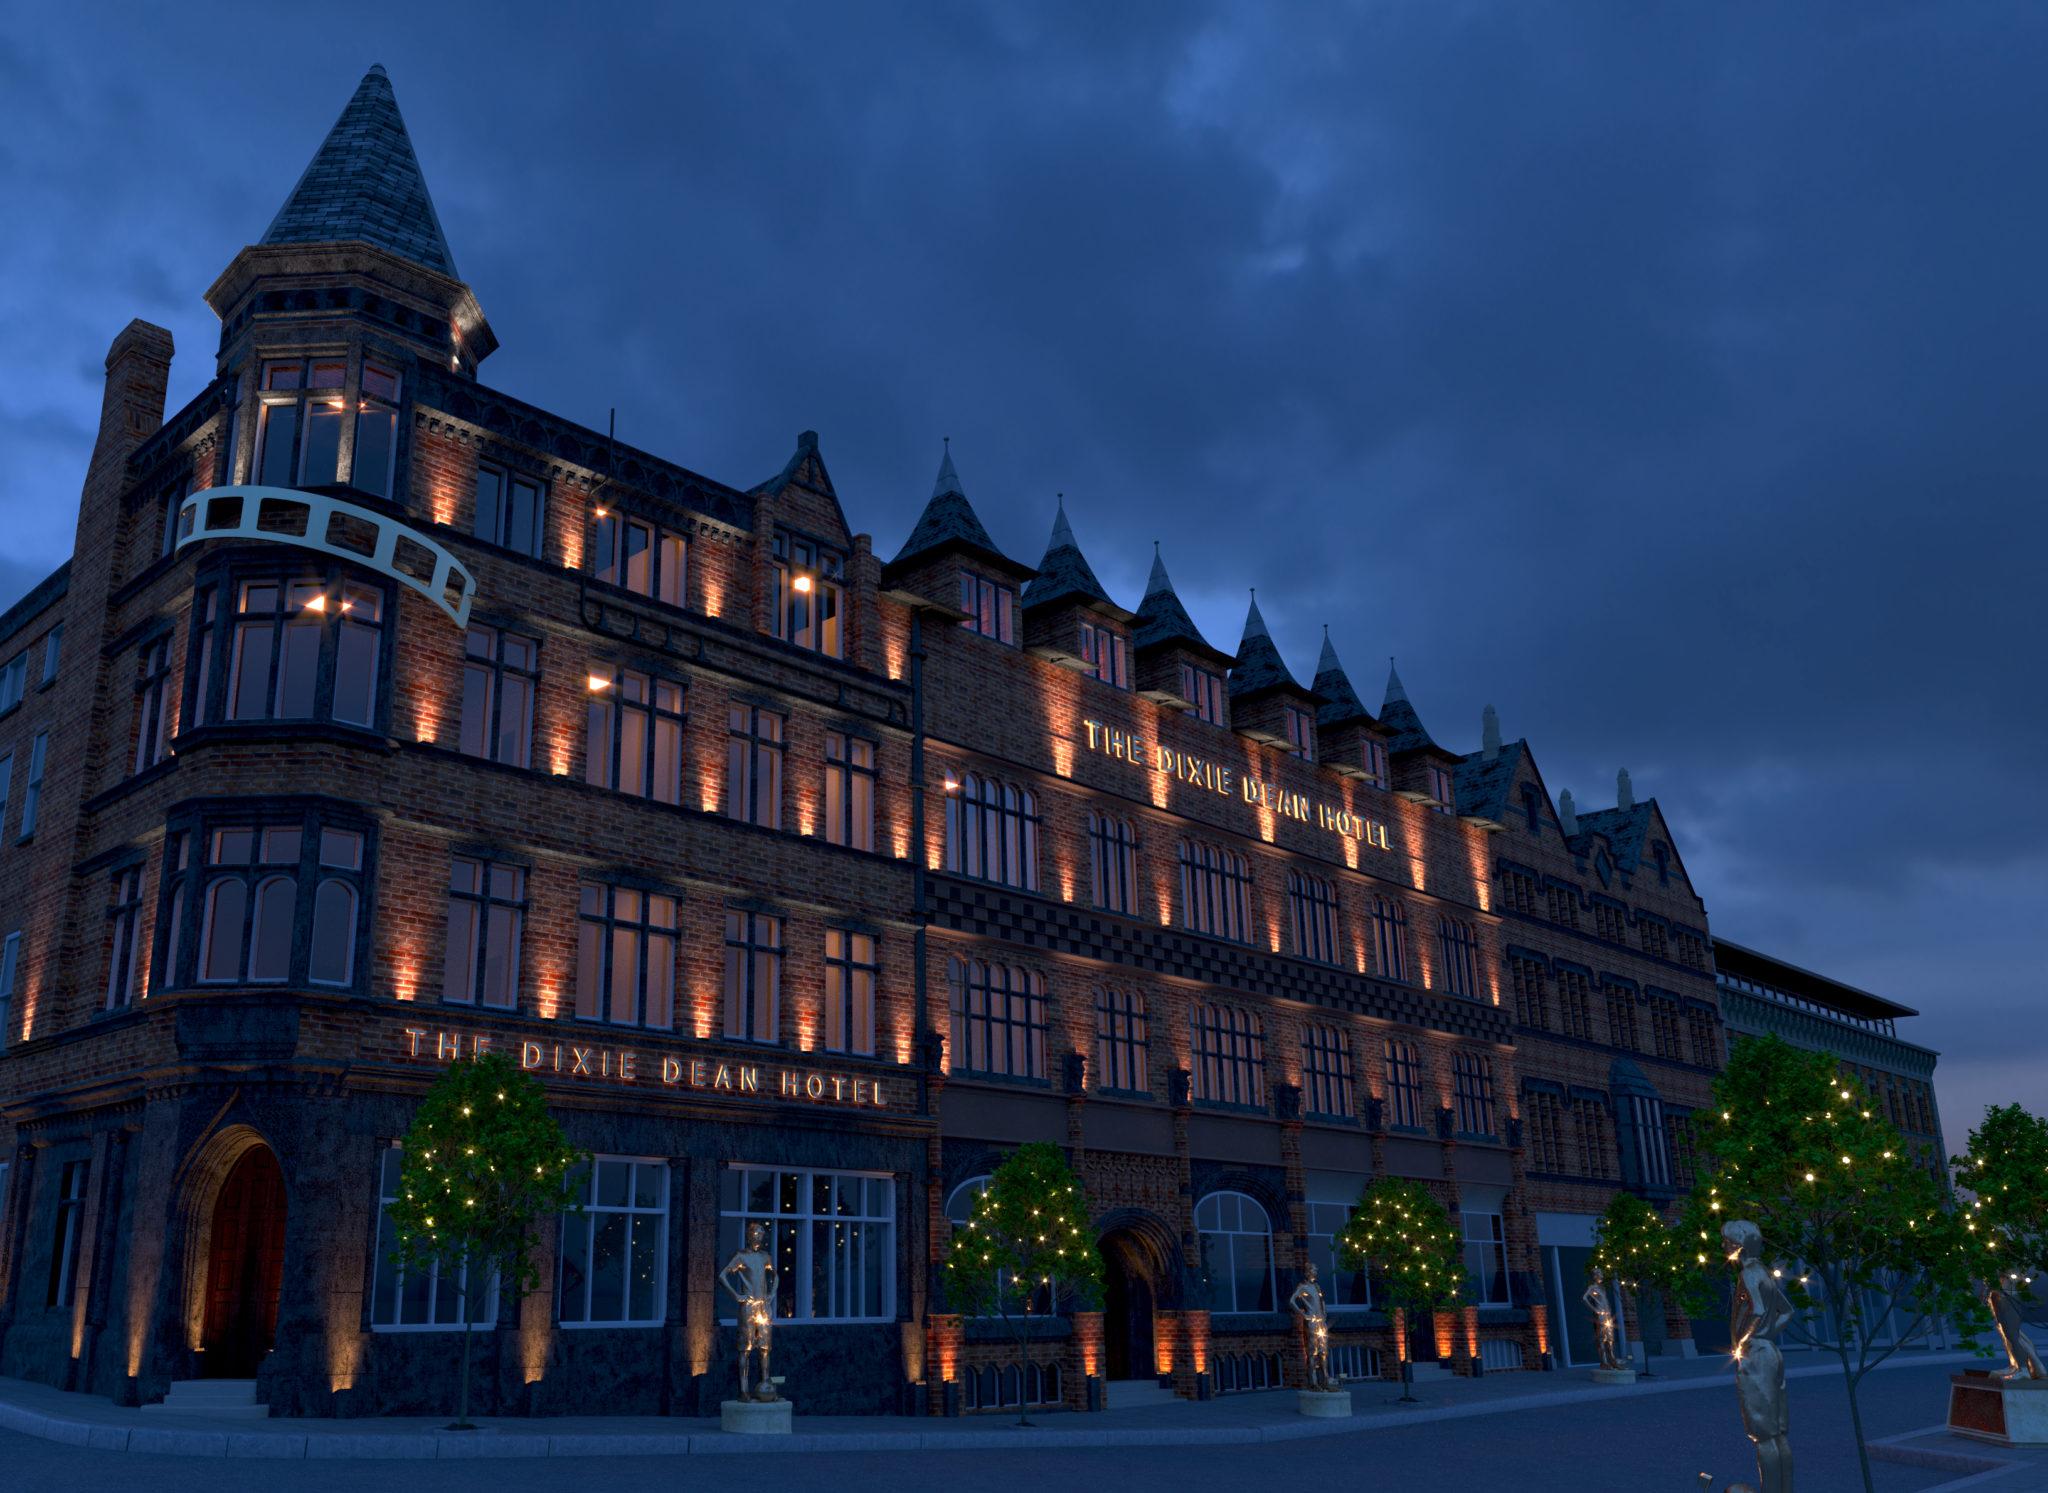 The Dixie Dean Hotel, Liverpool.